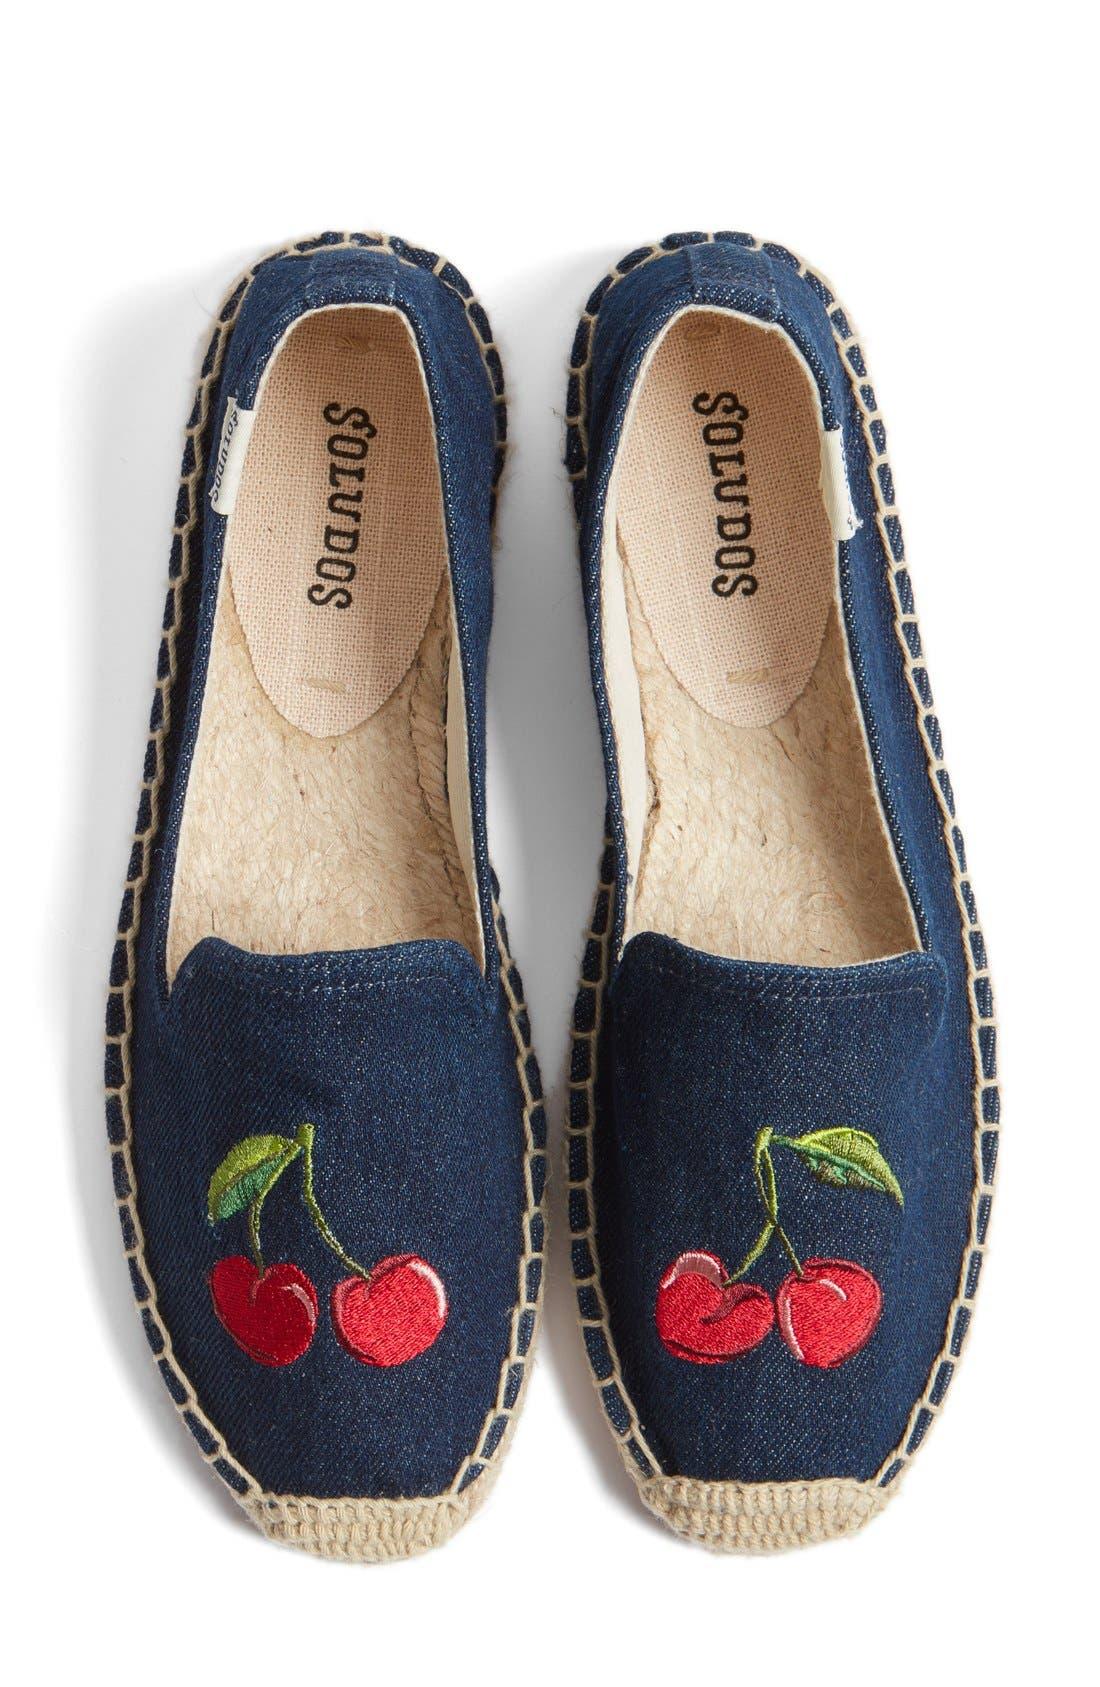 Main Image - Soludos 'Cherries' Embroidered Espadrille Slip-On (Women)